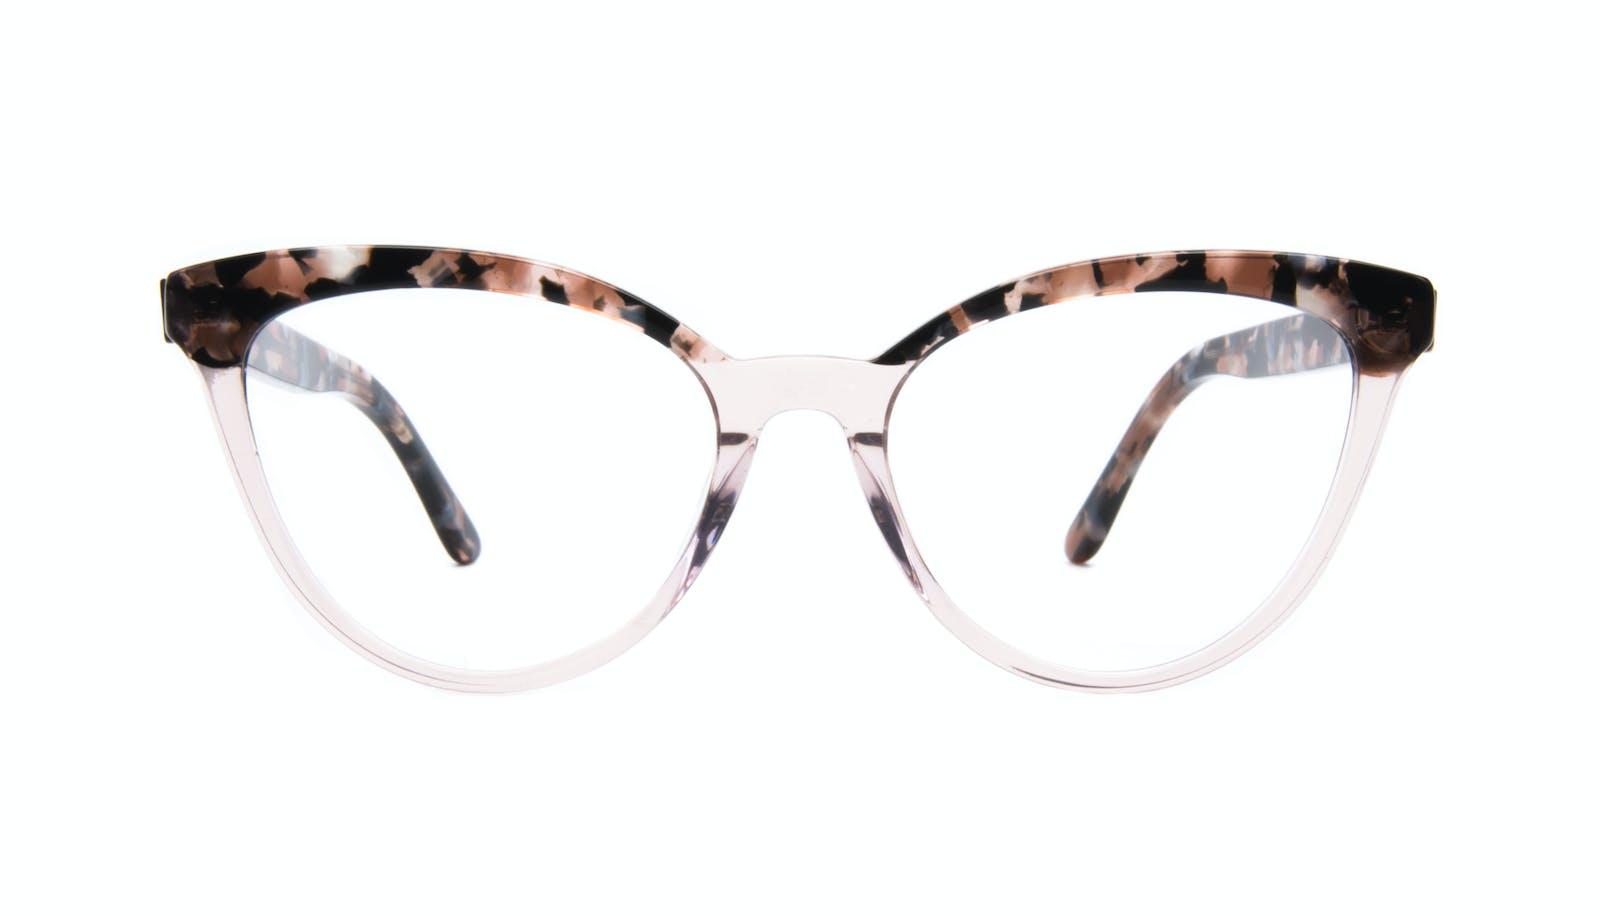 72ef1edd04f4 Affordable Fashion Glasses Cat Eye Daring Cateye Eyeglasses Women Reverie  Rose Tort